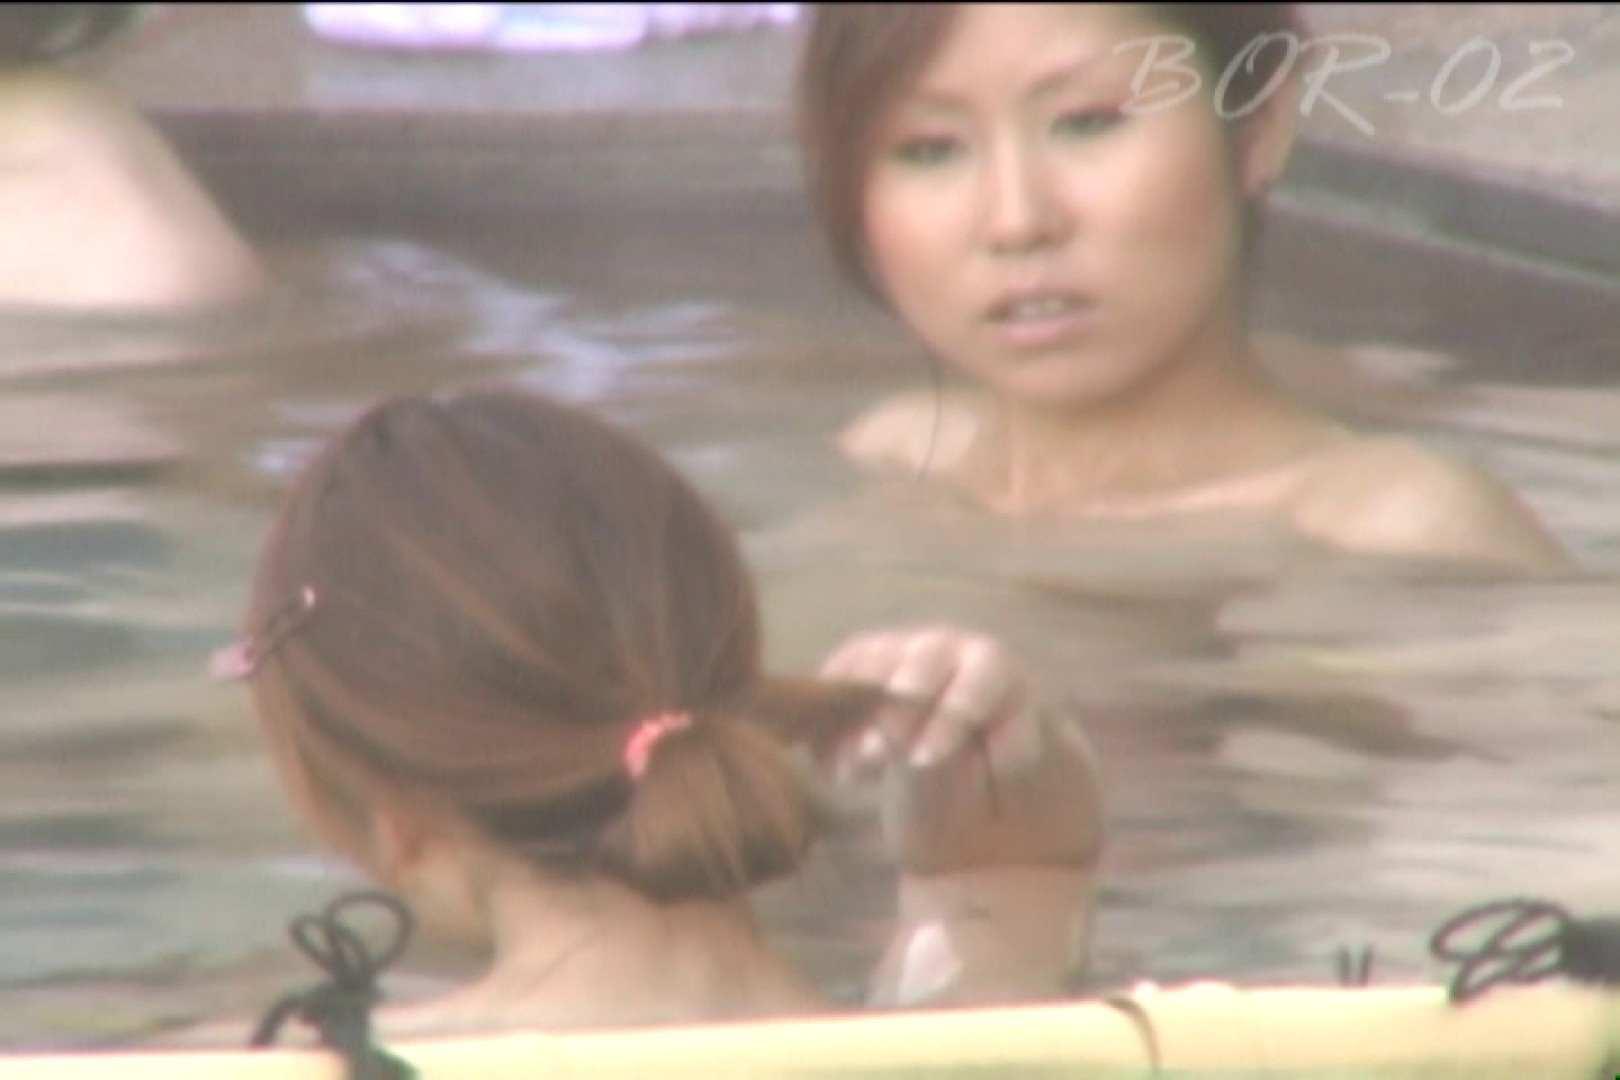 Aquaな露天風呂Vol.477 盗撮   OLエロ画像  99PICs 19